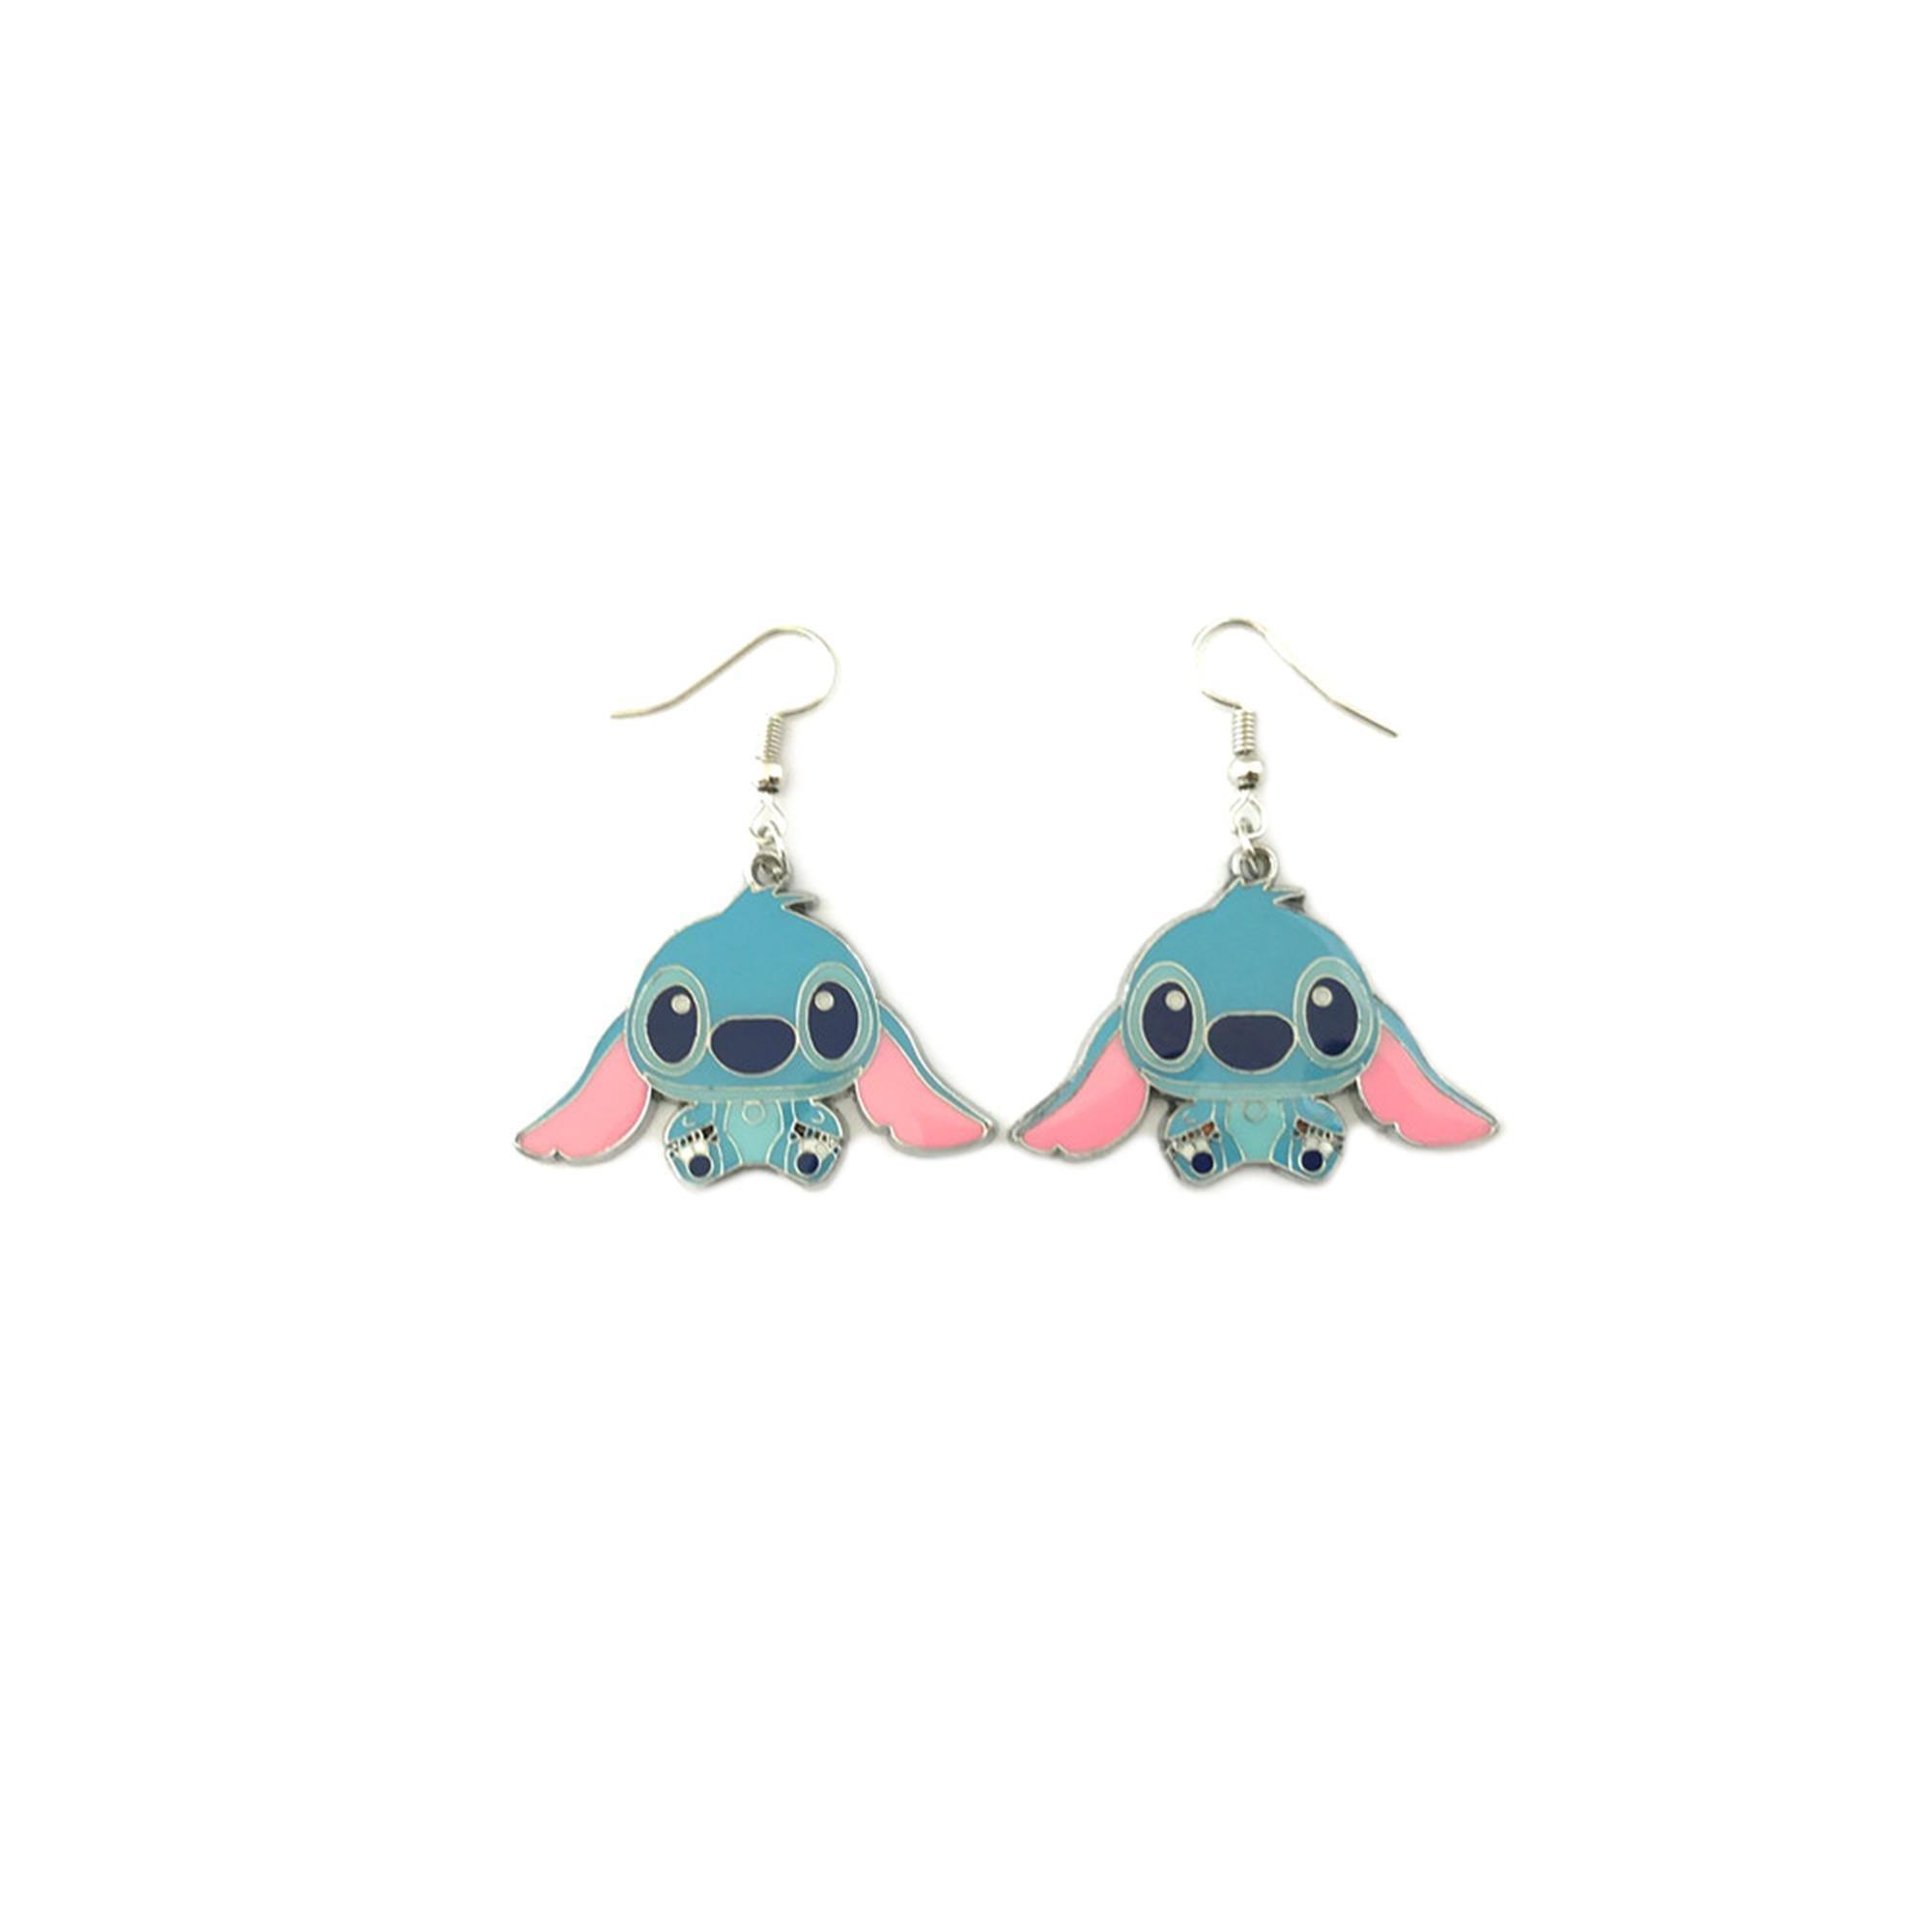 Athena Brand Movie Stitch of Lilo & Stitch Dangle Earrings In Gift Box